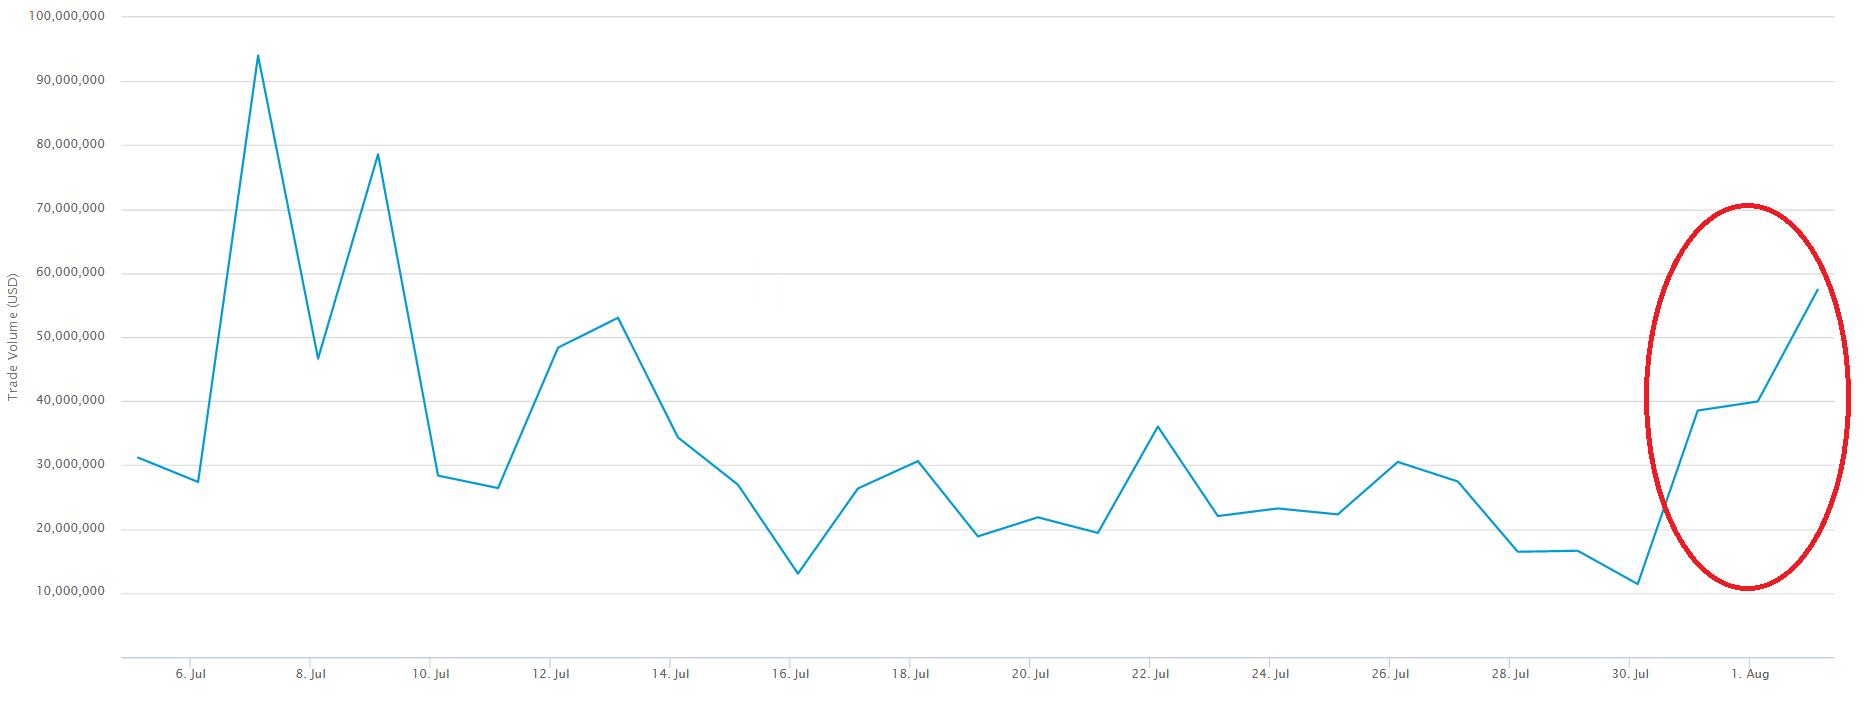 Bitcoin Transactions After Bitfinex Hack